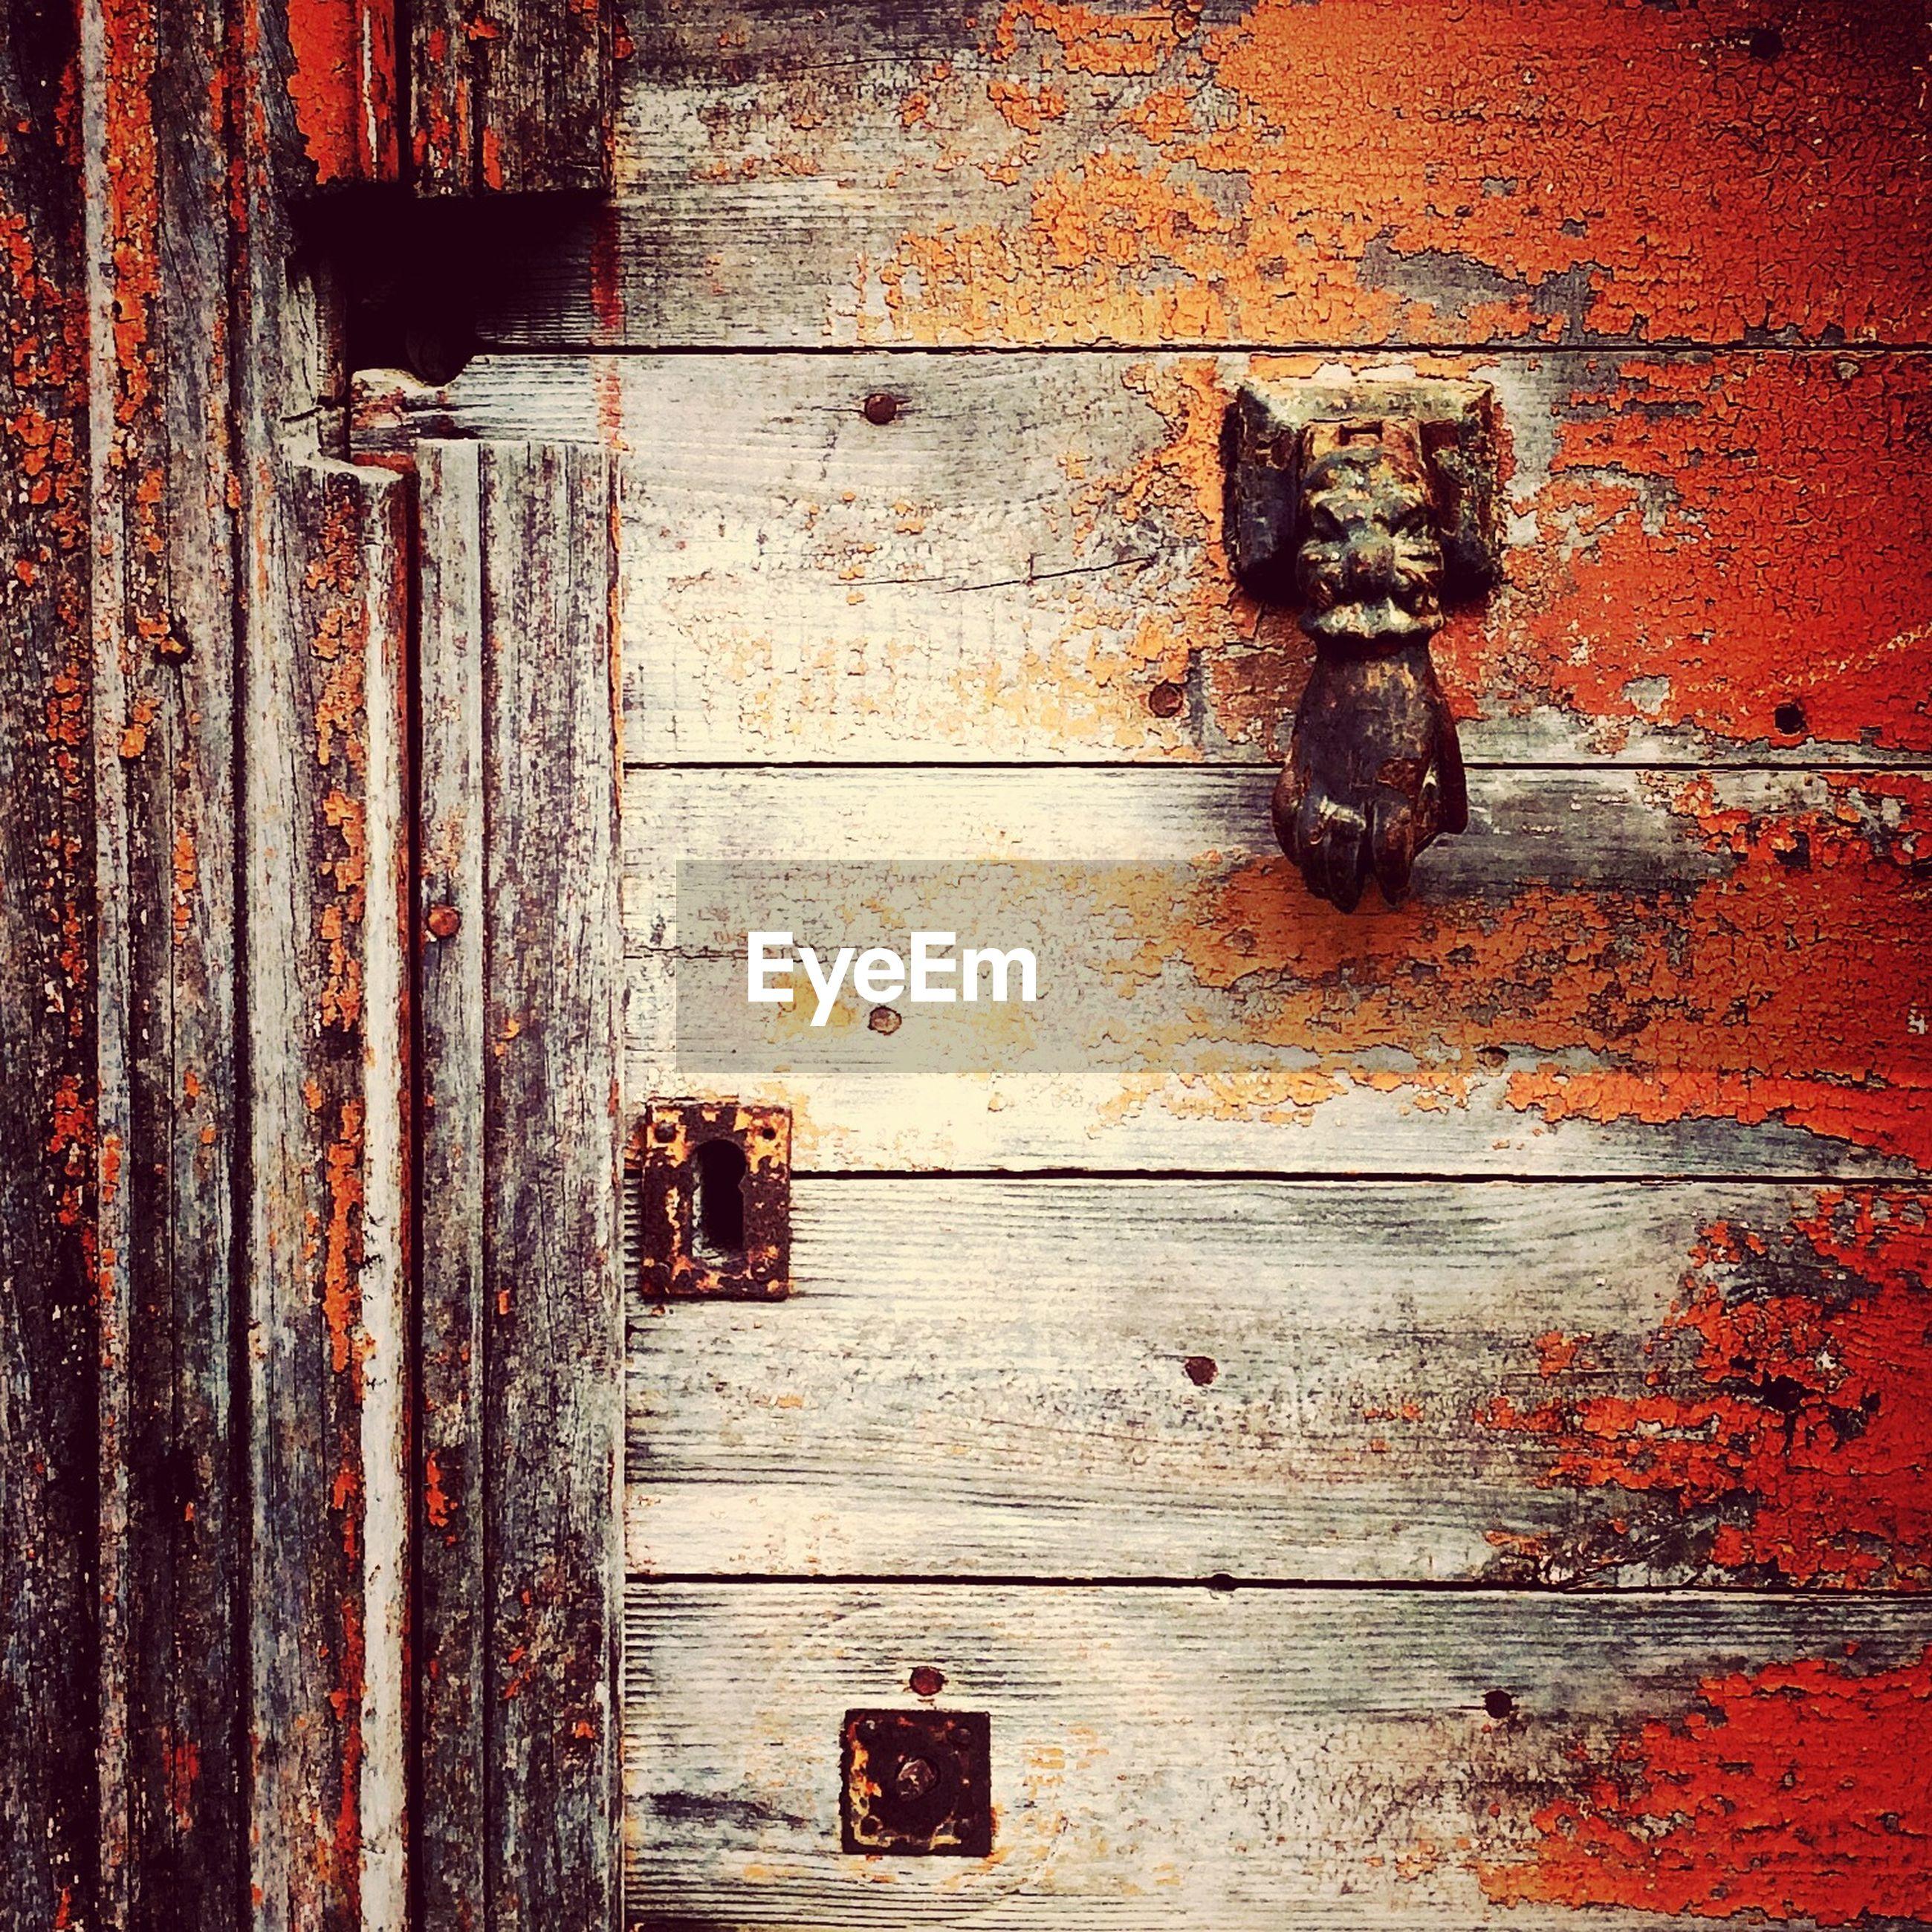 Door knob on weathered